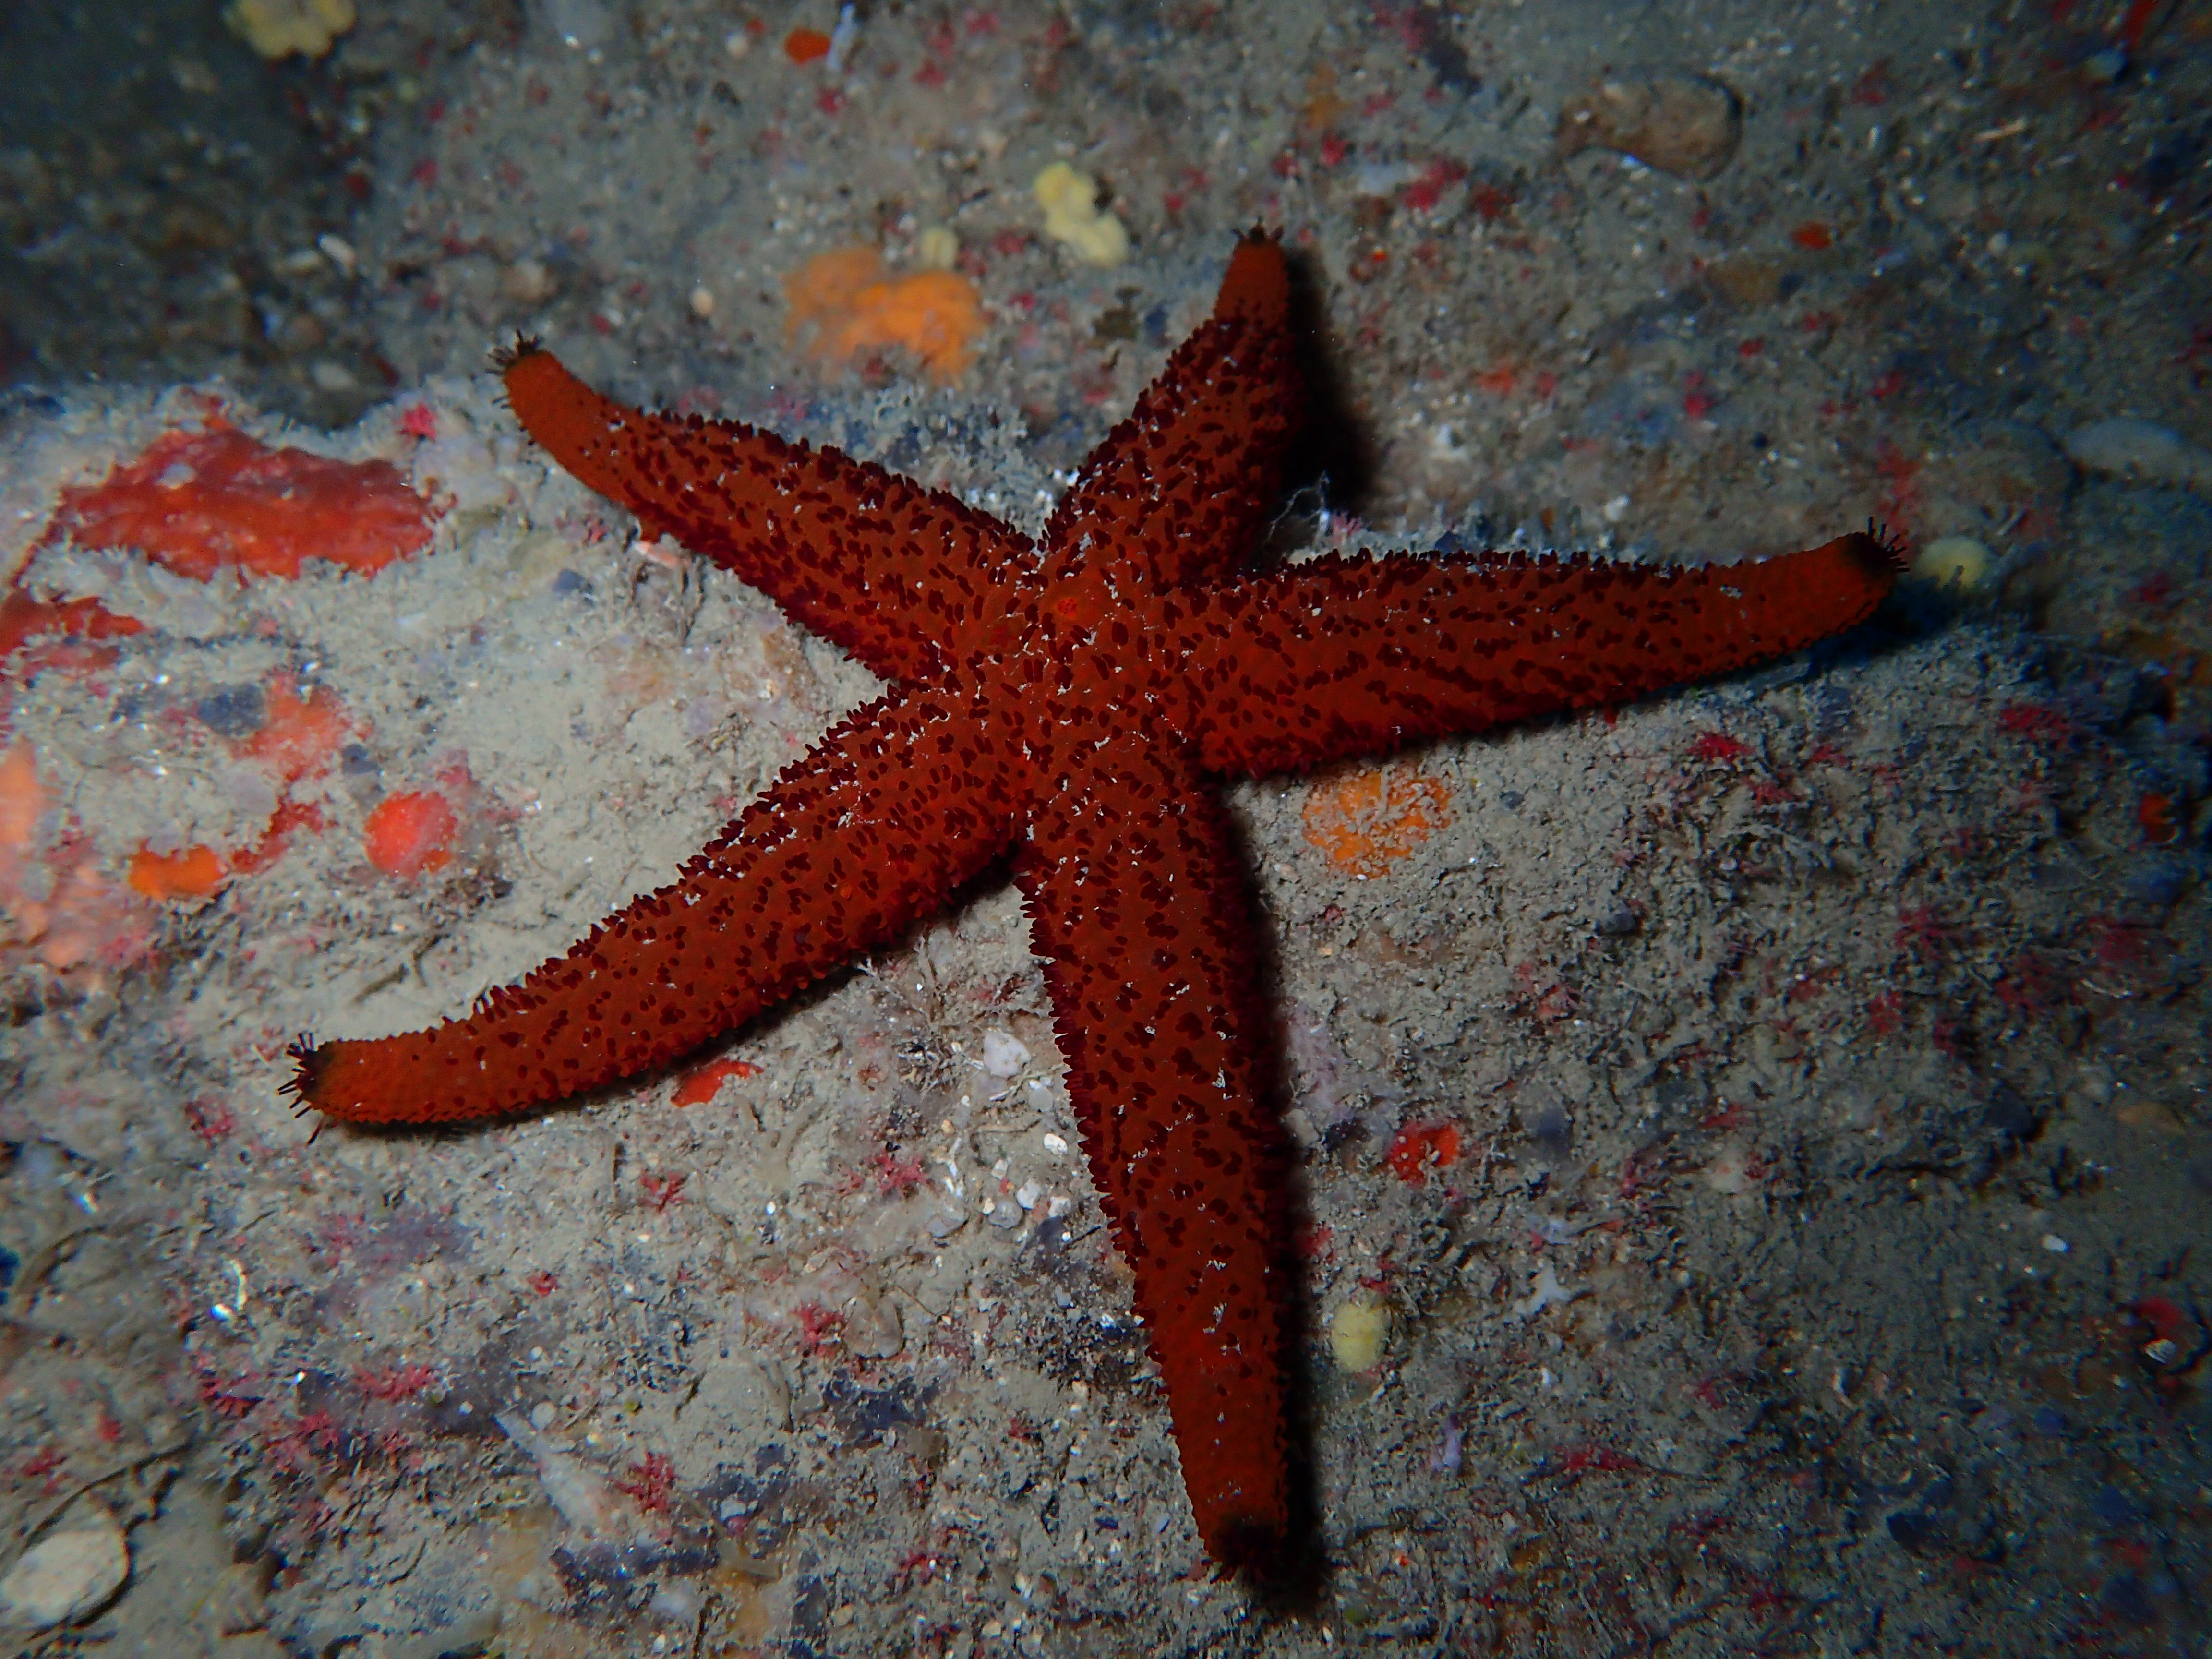 Athens Extreme Sports - Starfish